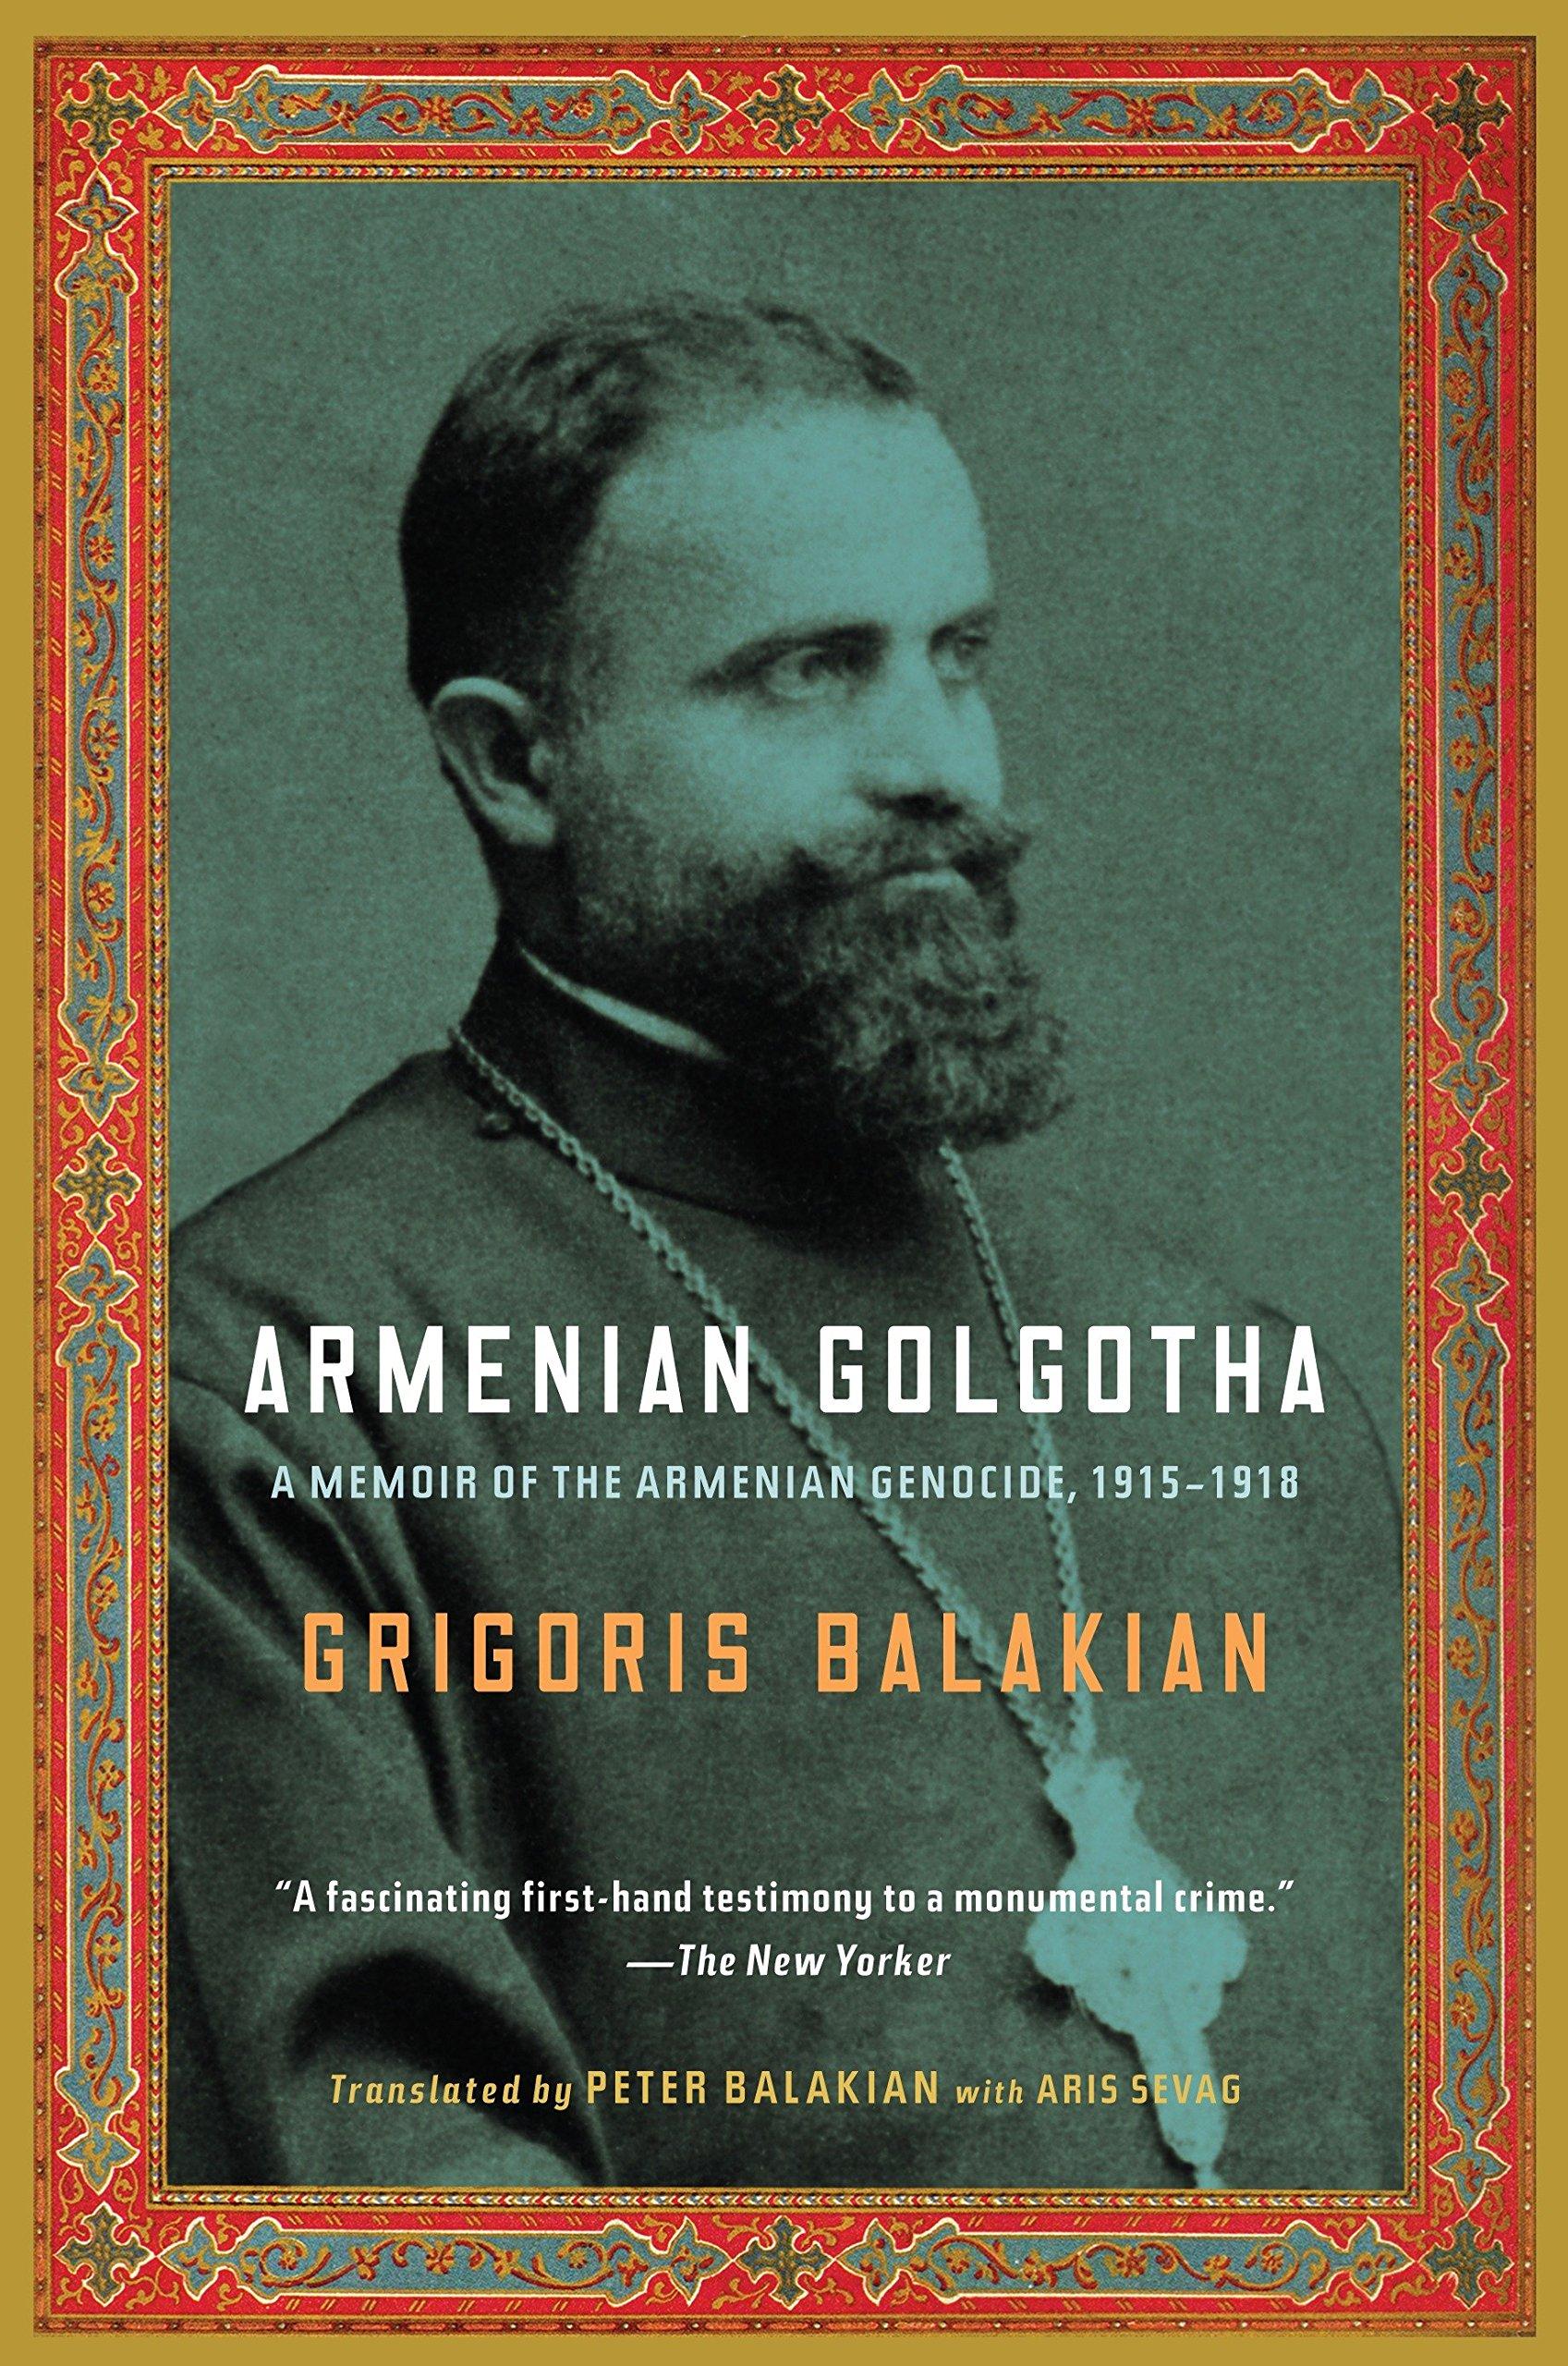 Armenian Golgotha: A Memoir of the Armenian Genocide, 1915-1918